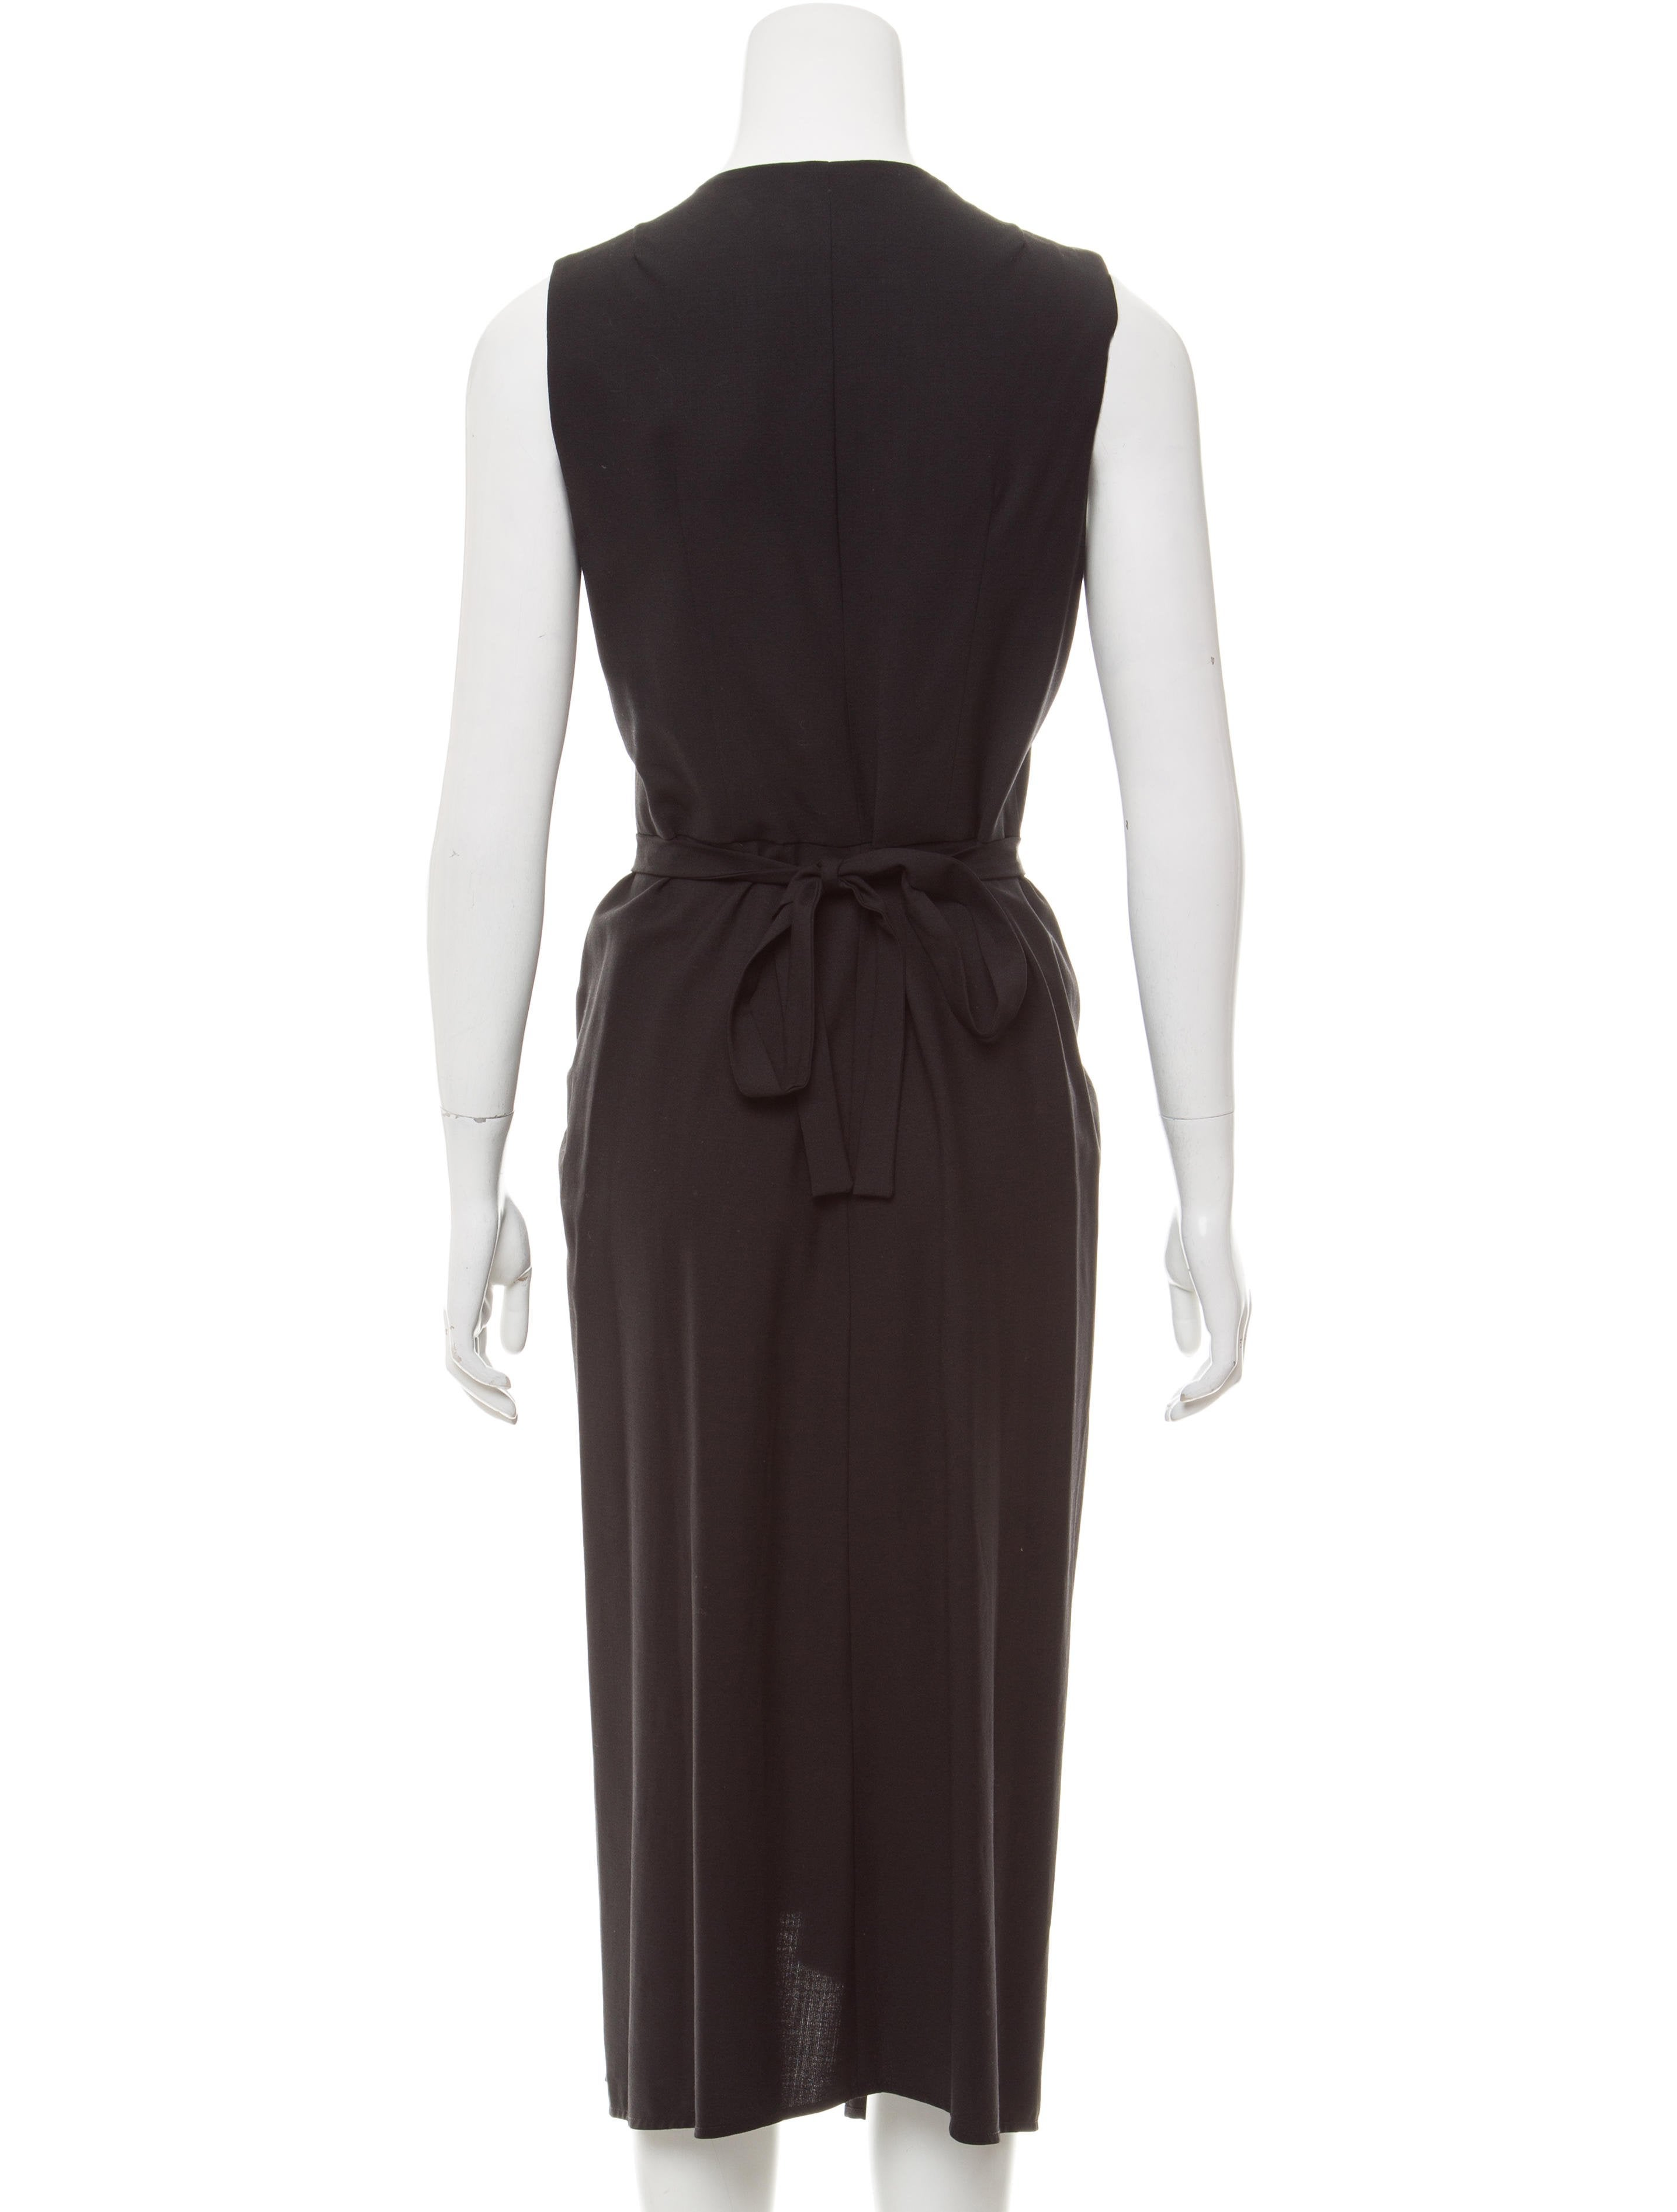 Morgane Le Fay Wool Midi Dress Clothing Mlf20226 The